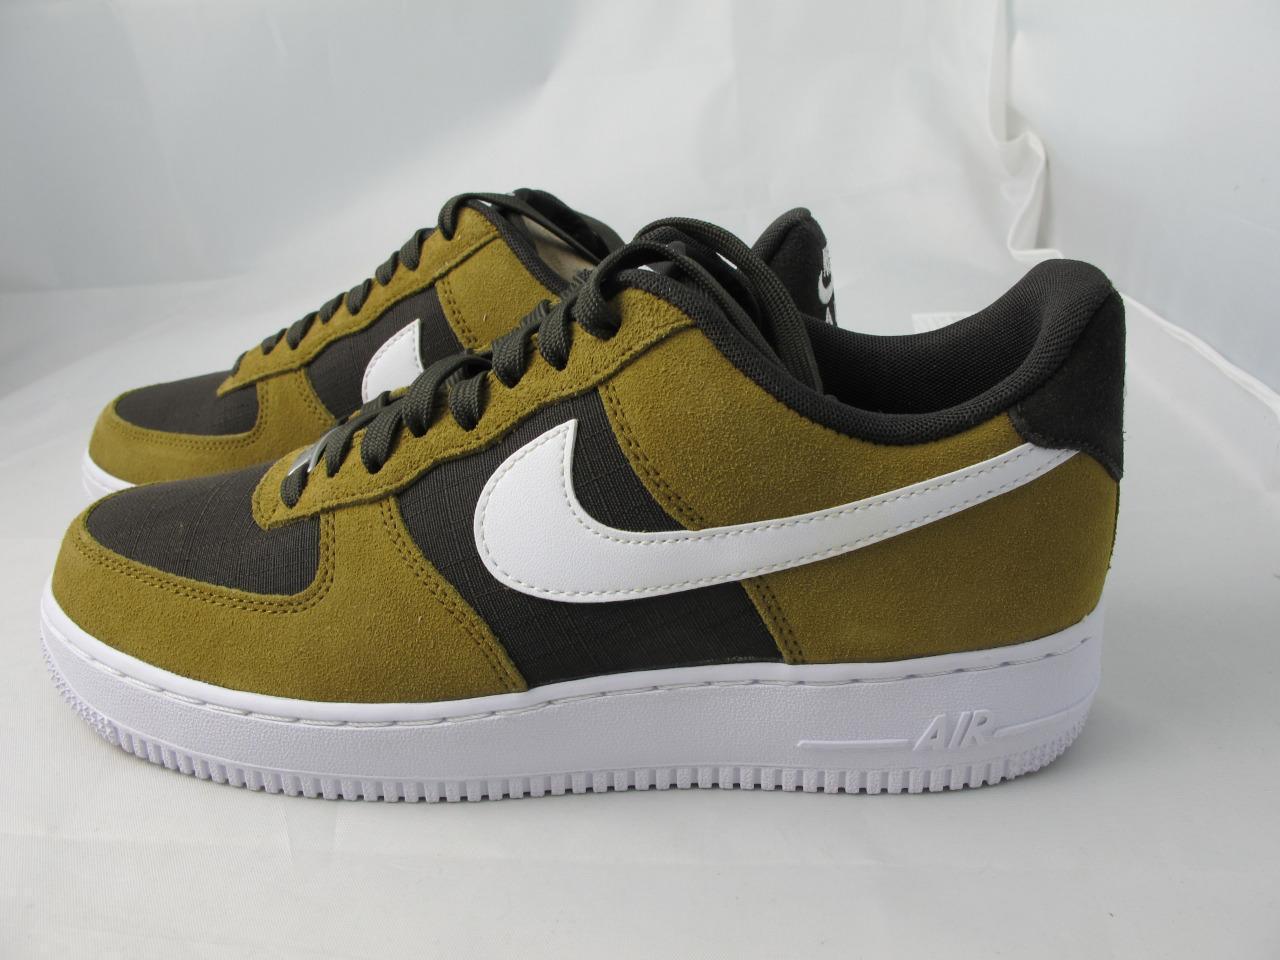 Nike Air Force 1 Golden Tan Mens Trainers 488298 207 12 eBay